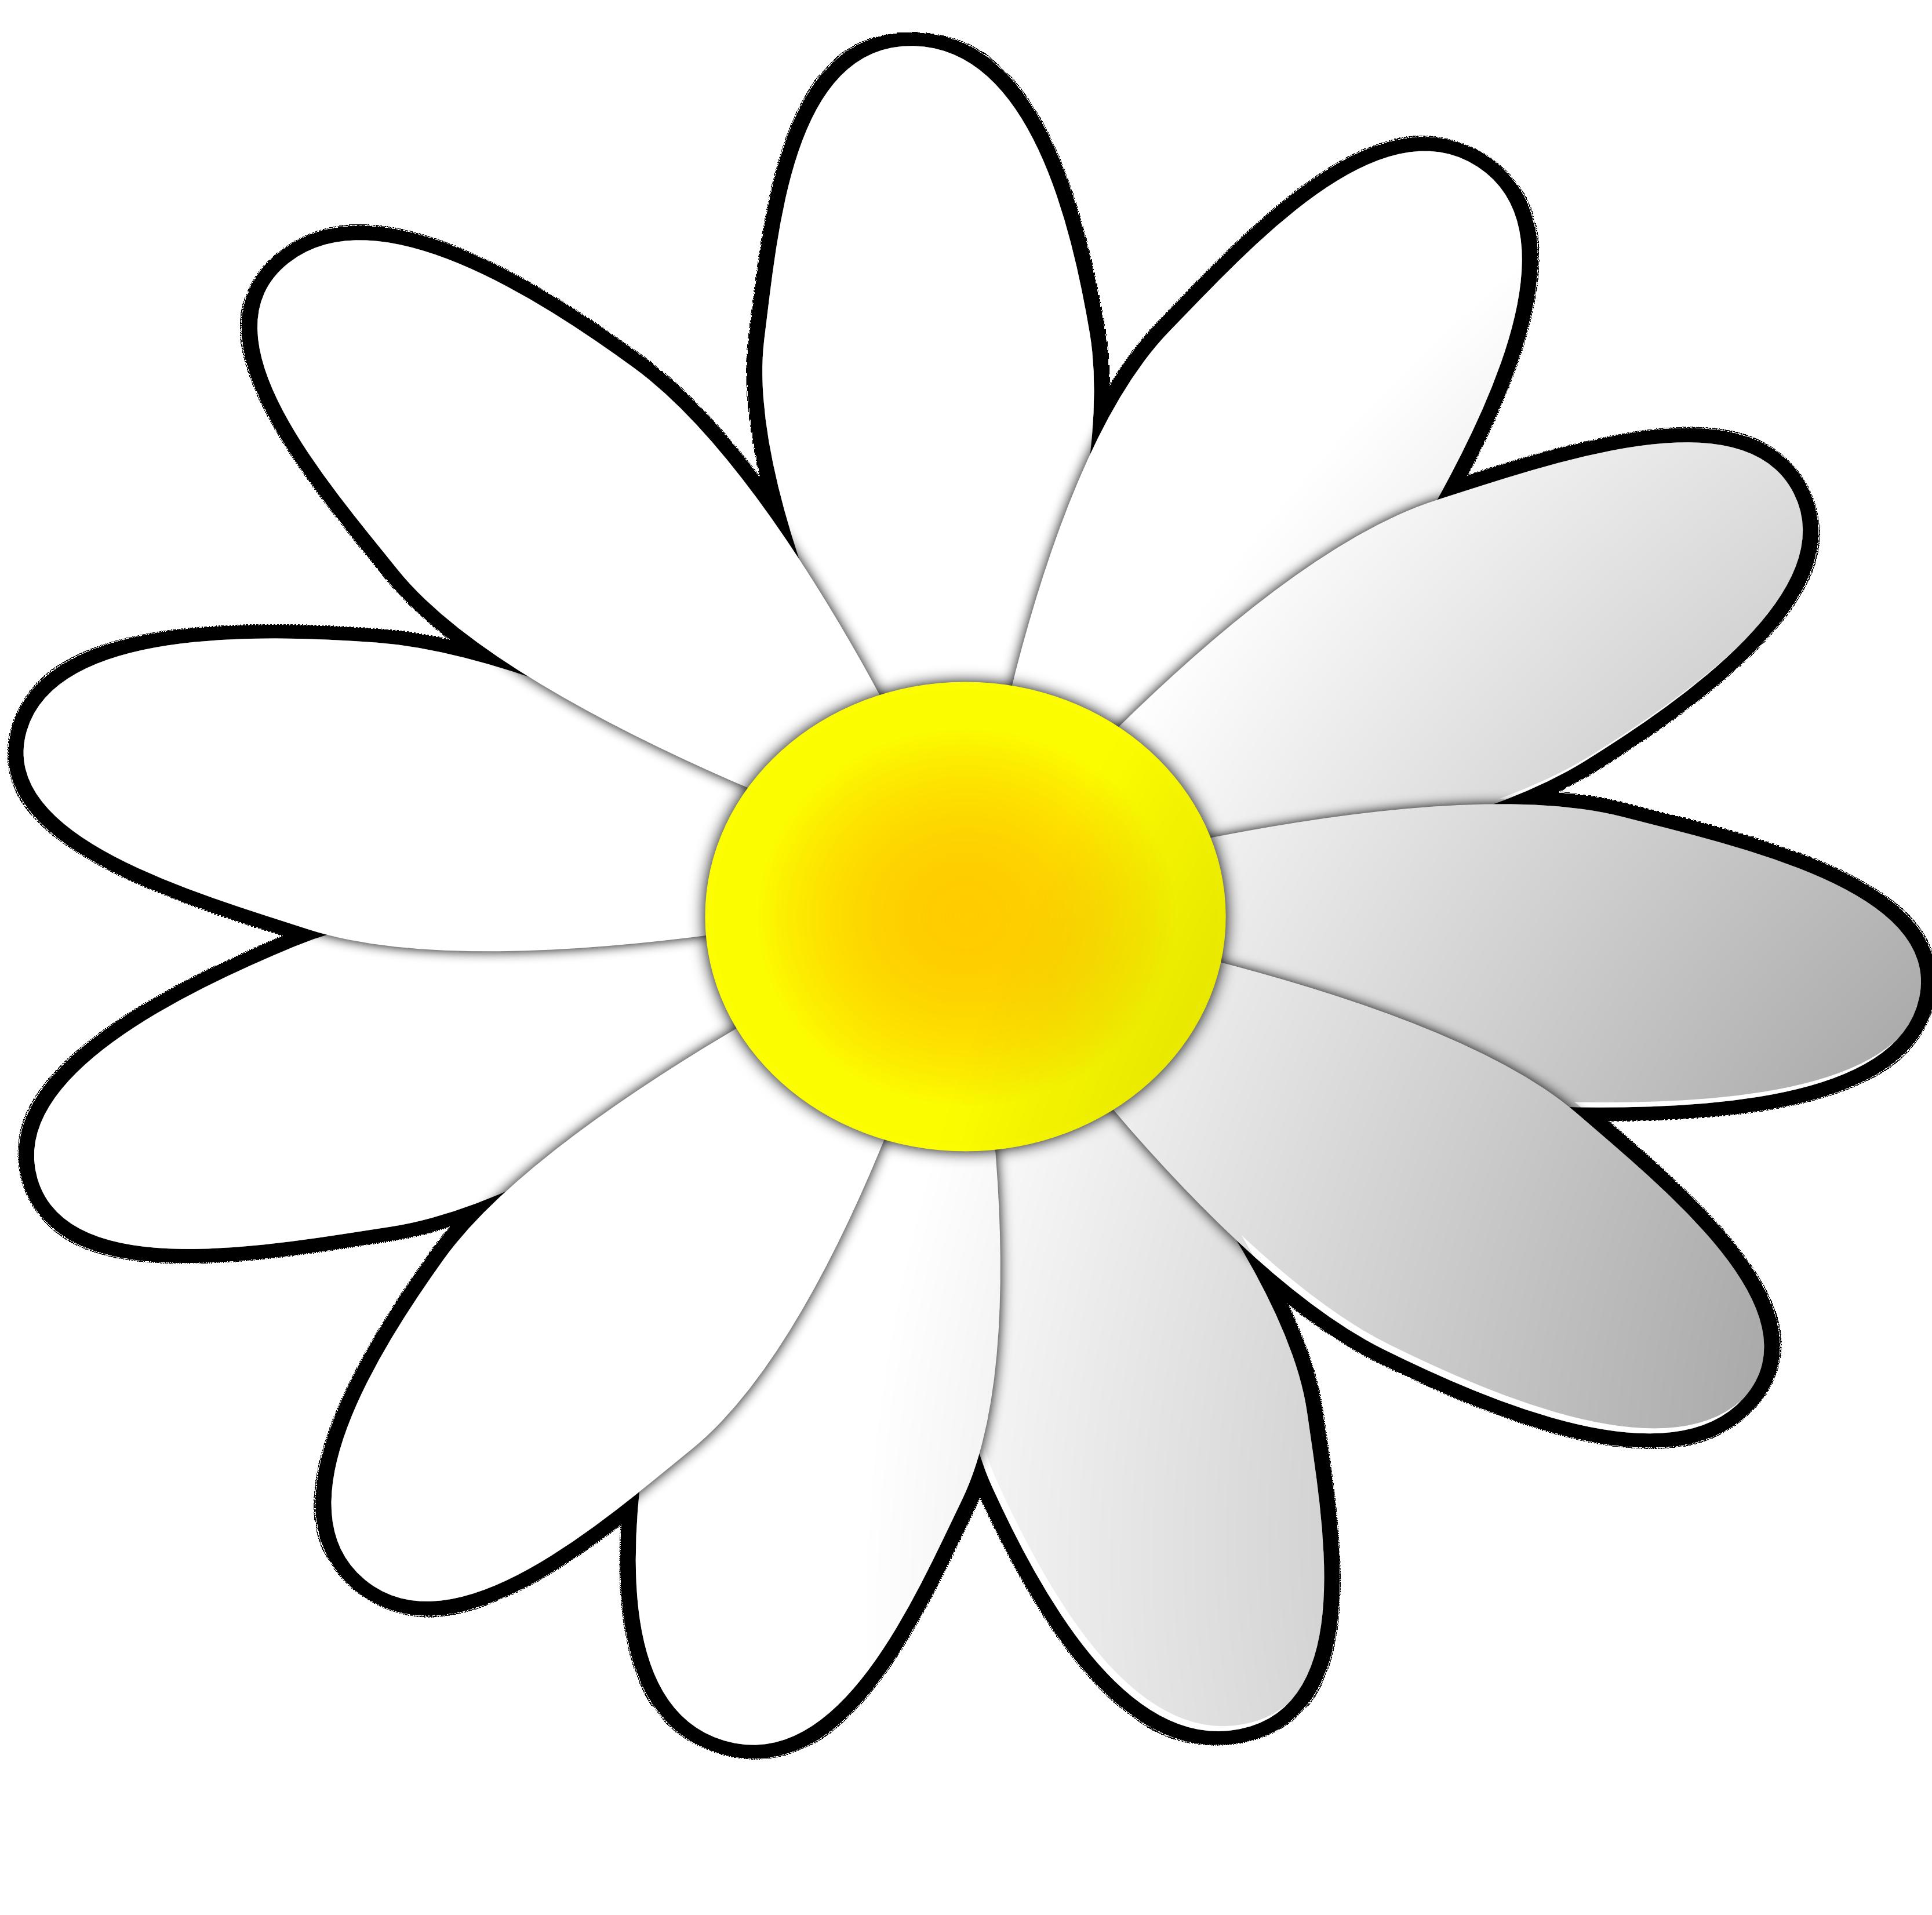 Daisy Image Clip Art-Daisy Image Clip Art-4